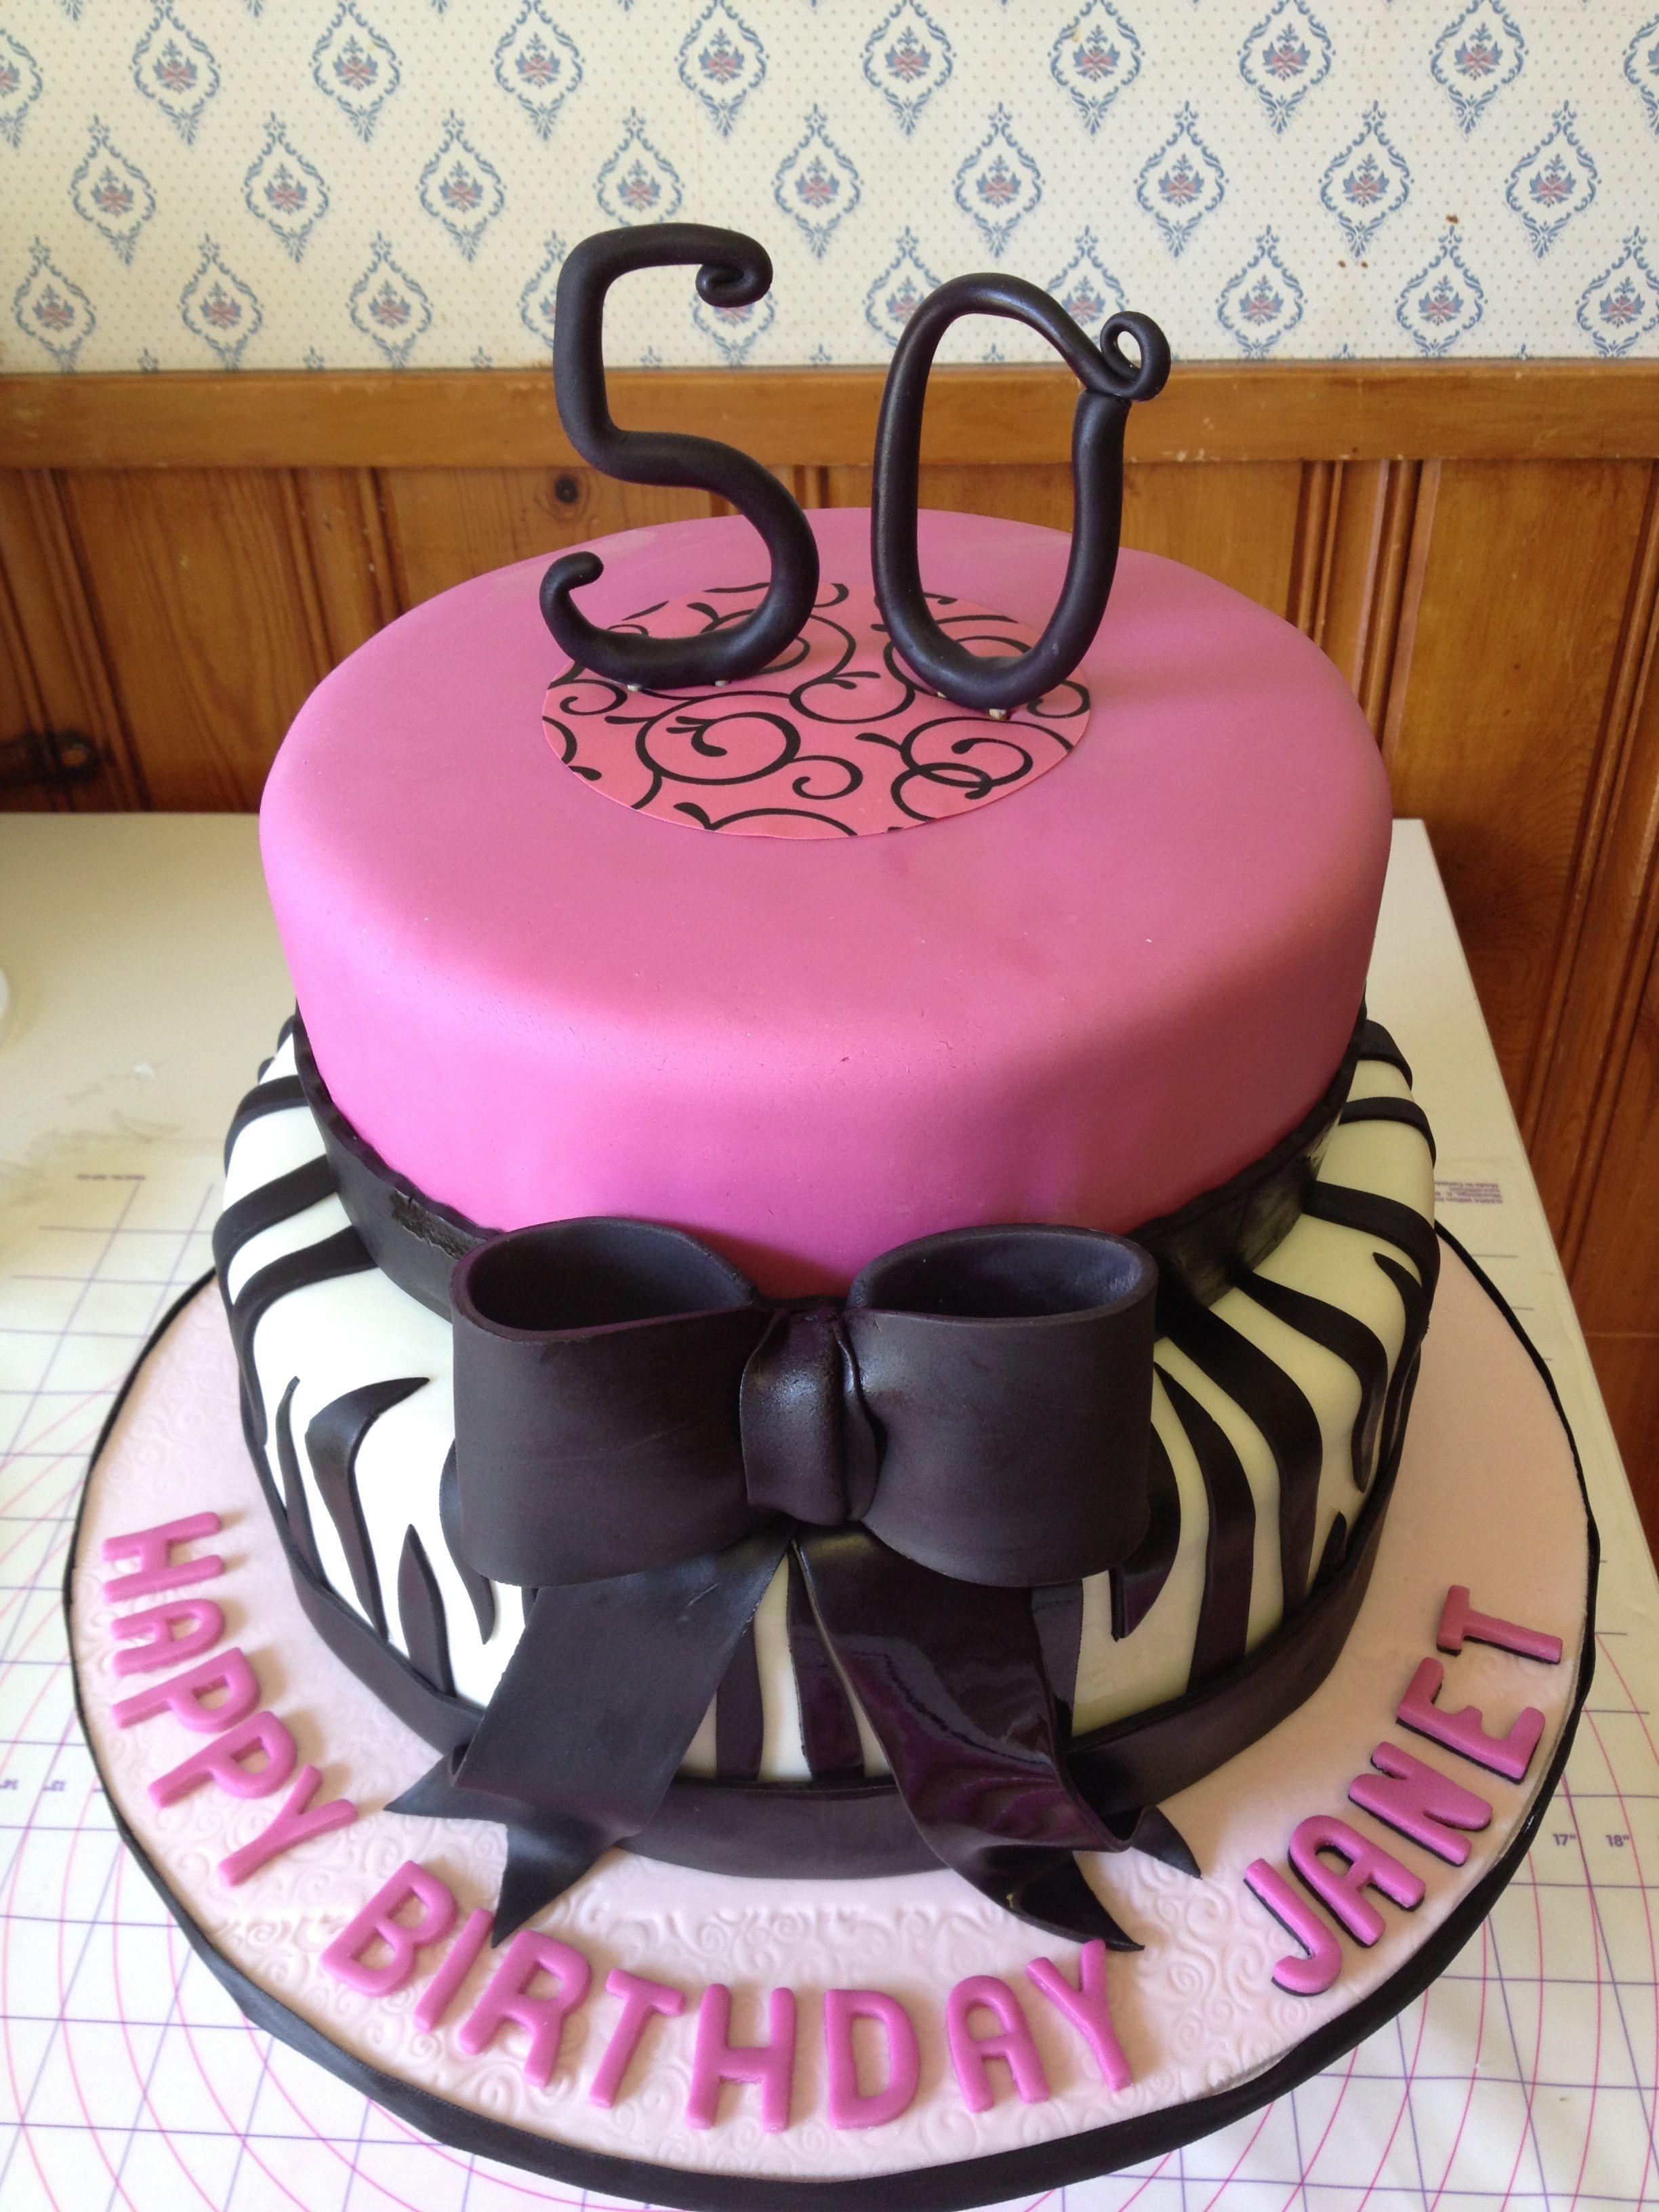 Elegant 50th birthday cake (With images) 50th birthday